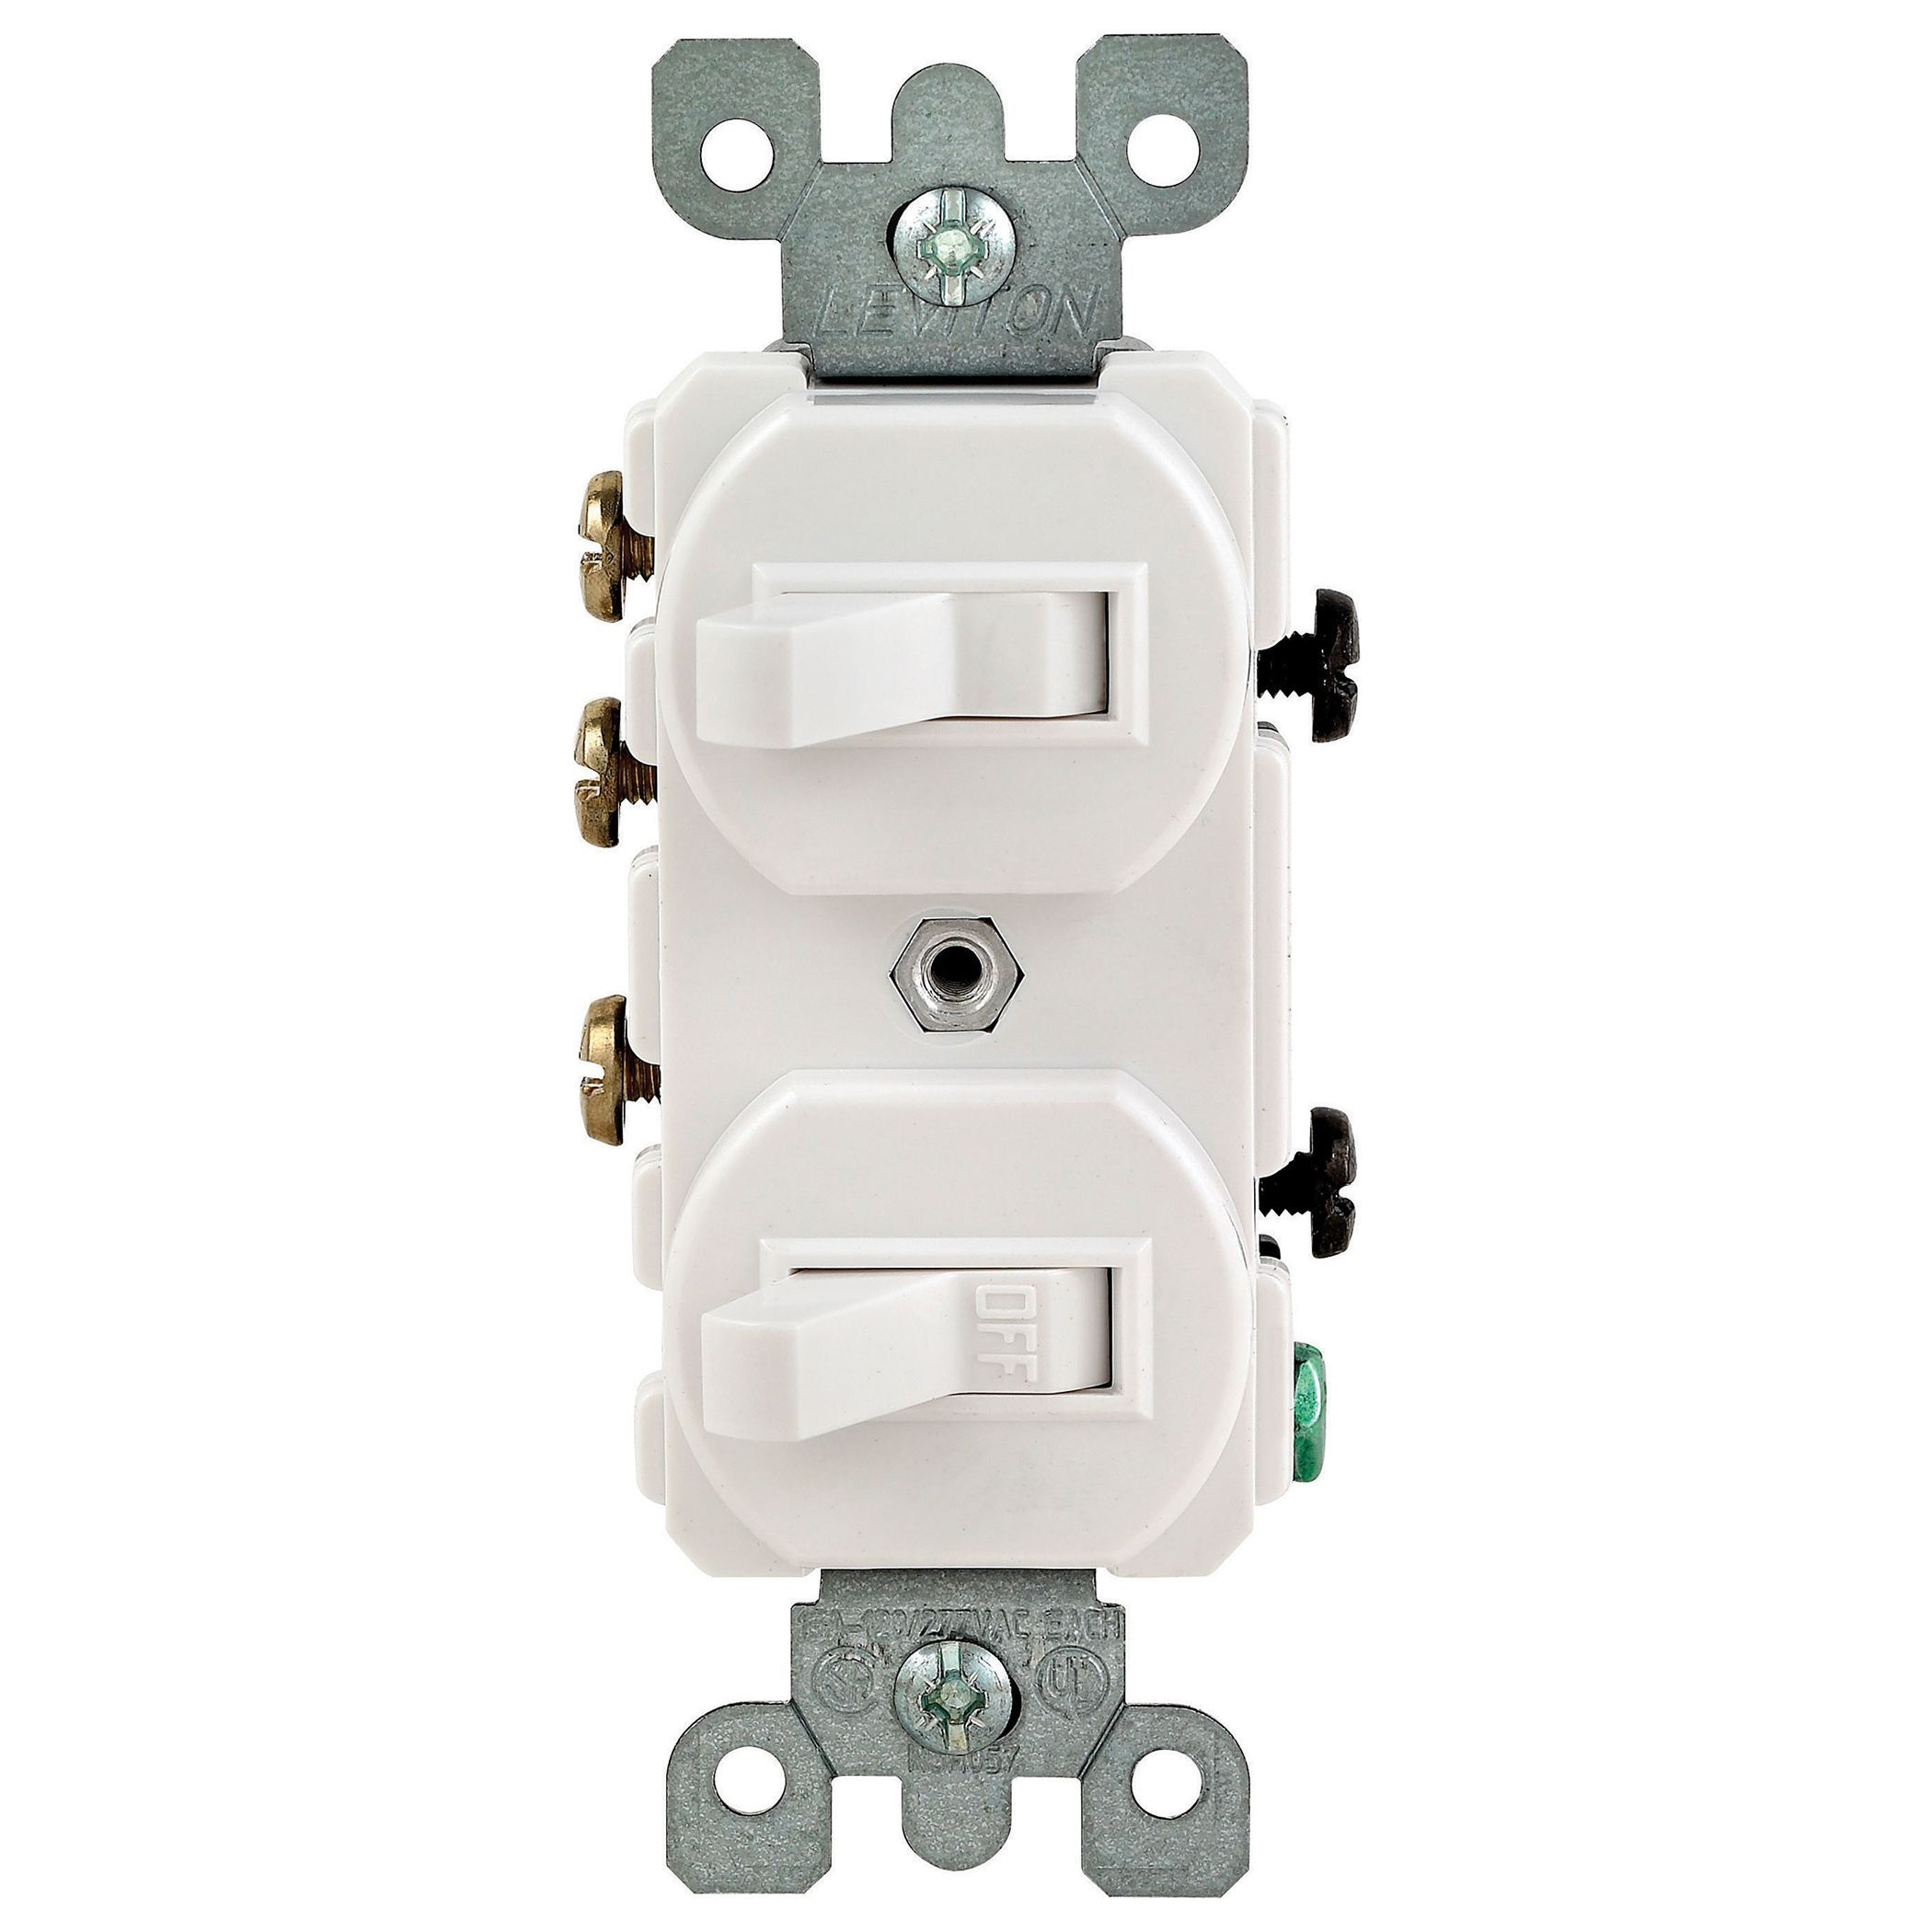 3 Way Switch Wiring Diagram 3 way switch wiring, Home